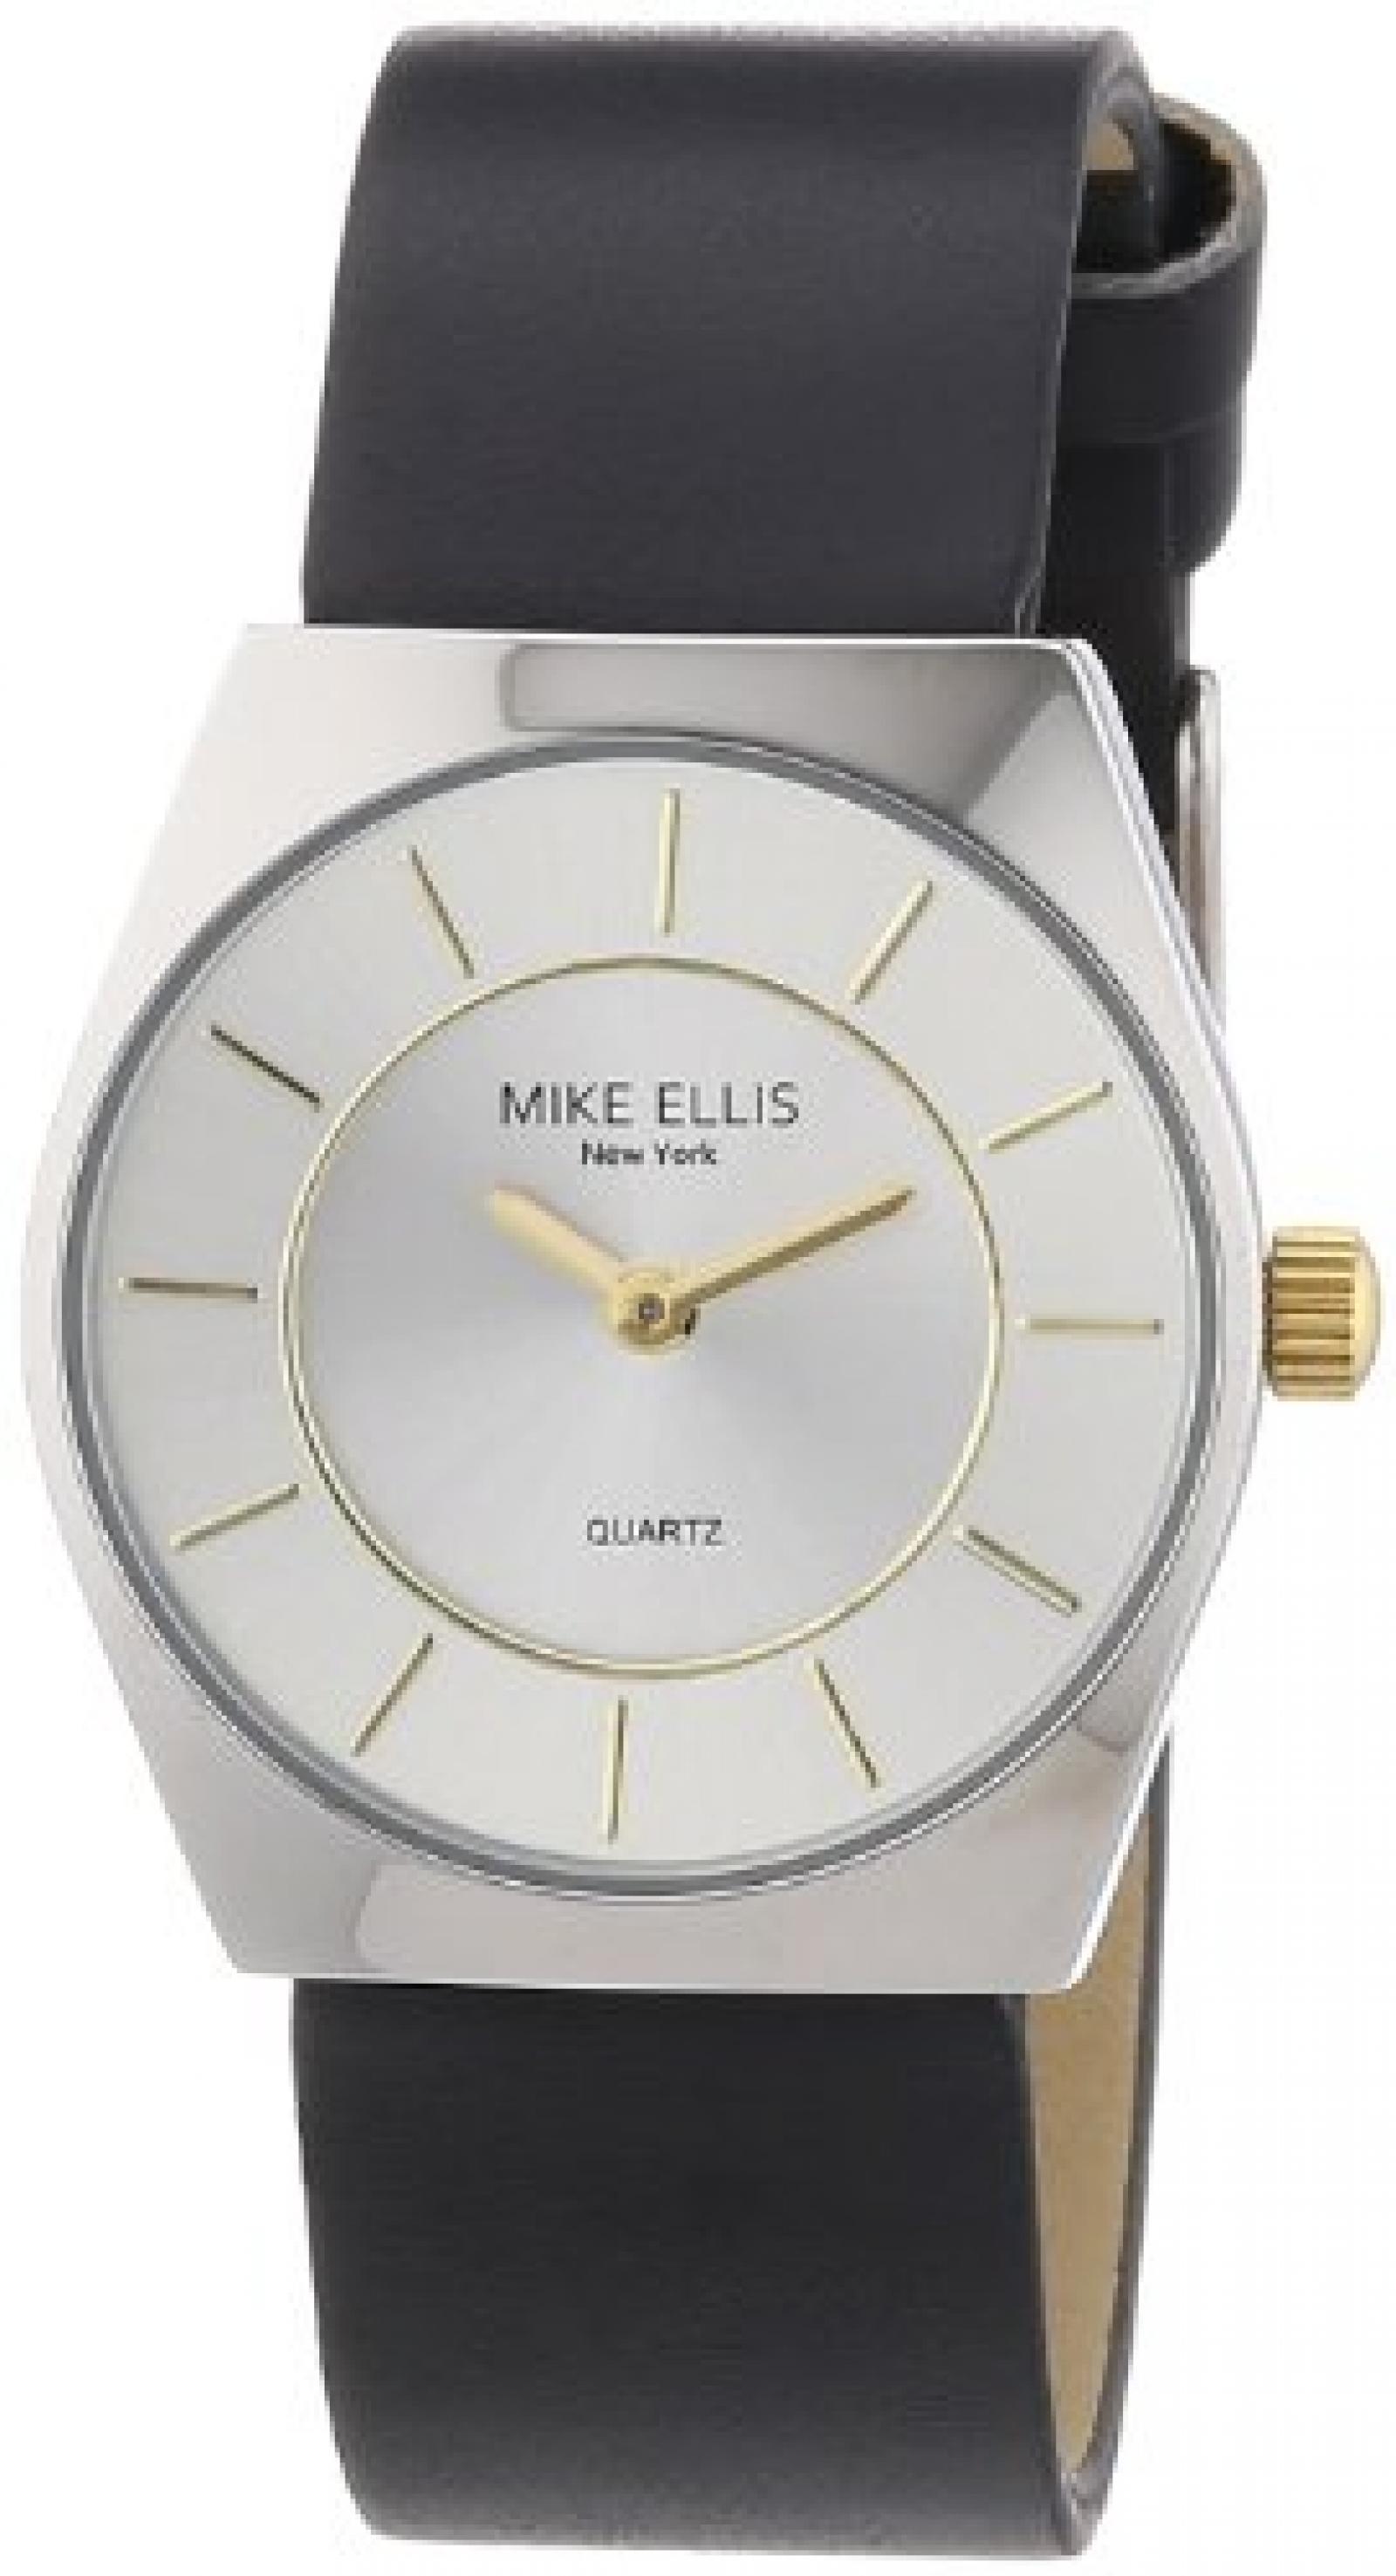 Mike Ellis New York Damen-Armbanduhr XS Analog Quarz L1126ASU/1